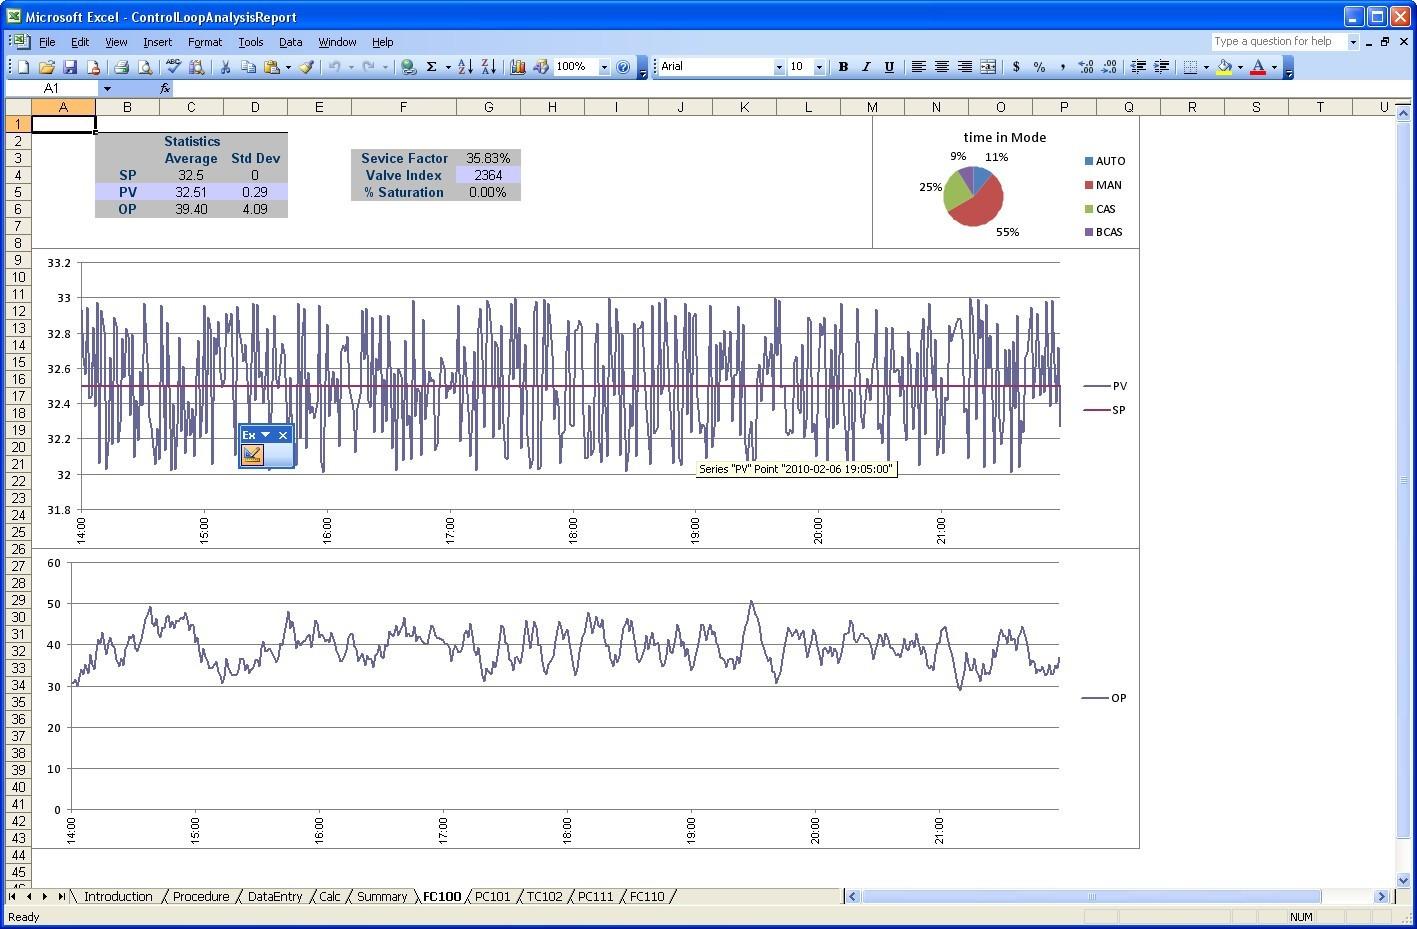 Matrikon OPC Excel Reporter latest version - Get best Windows software